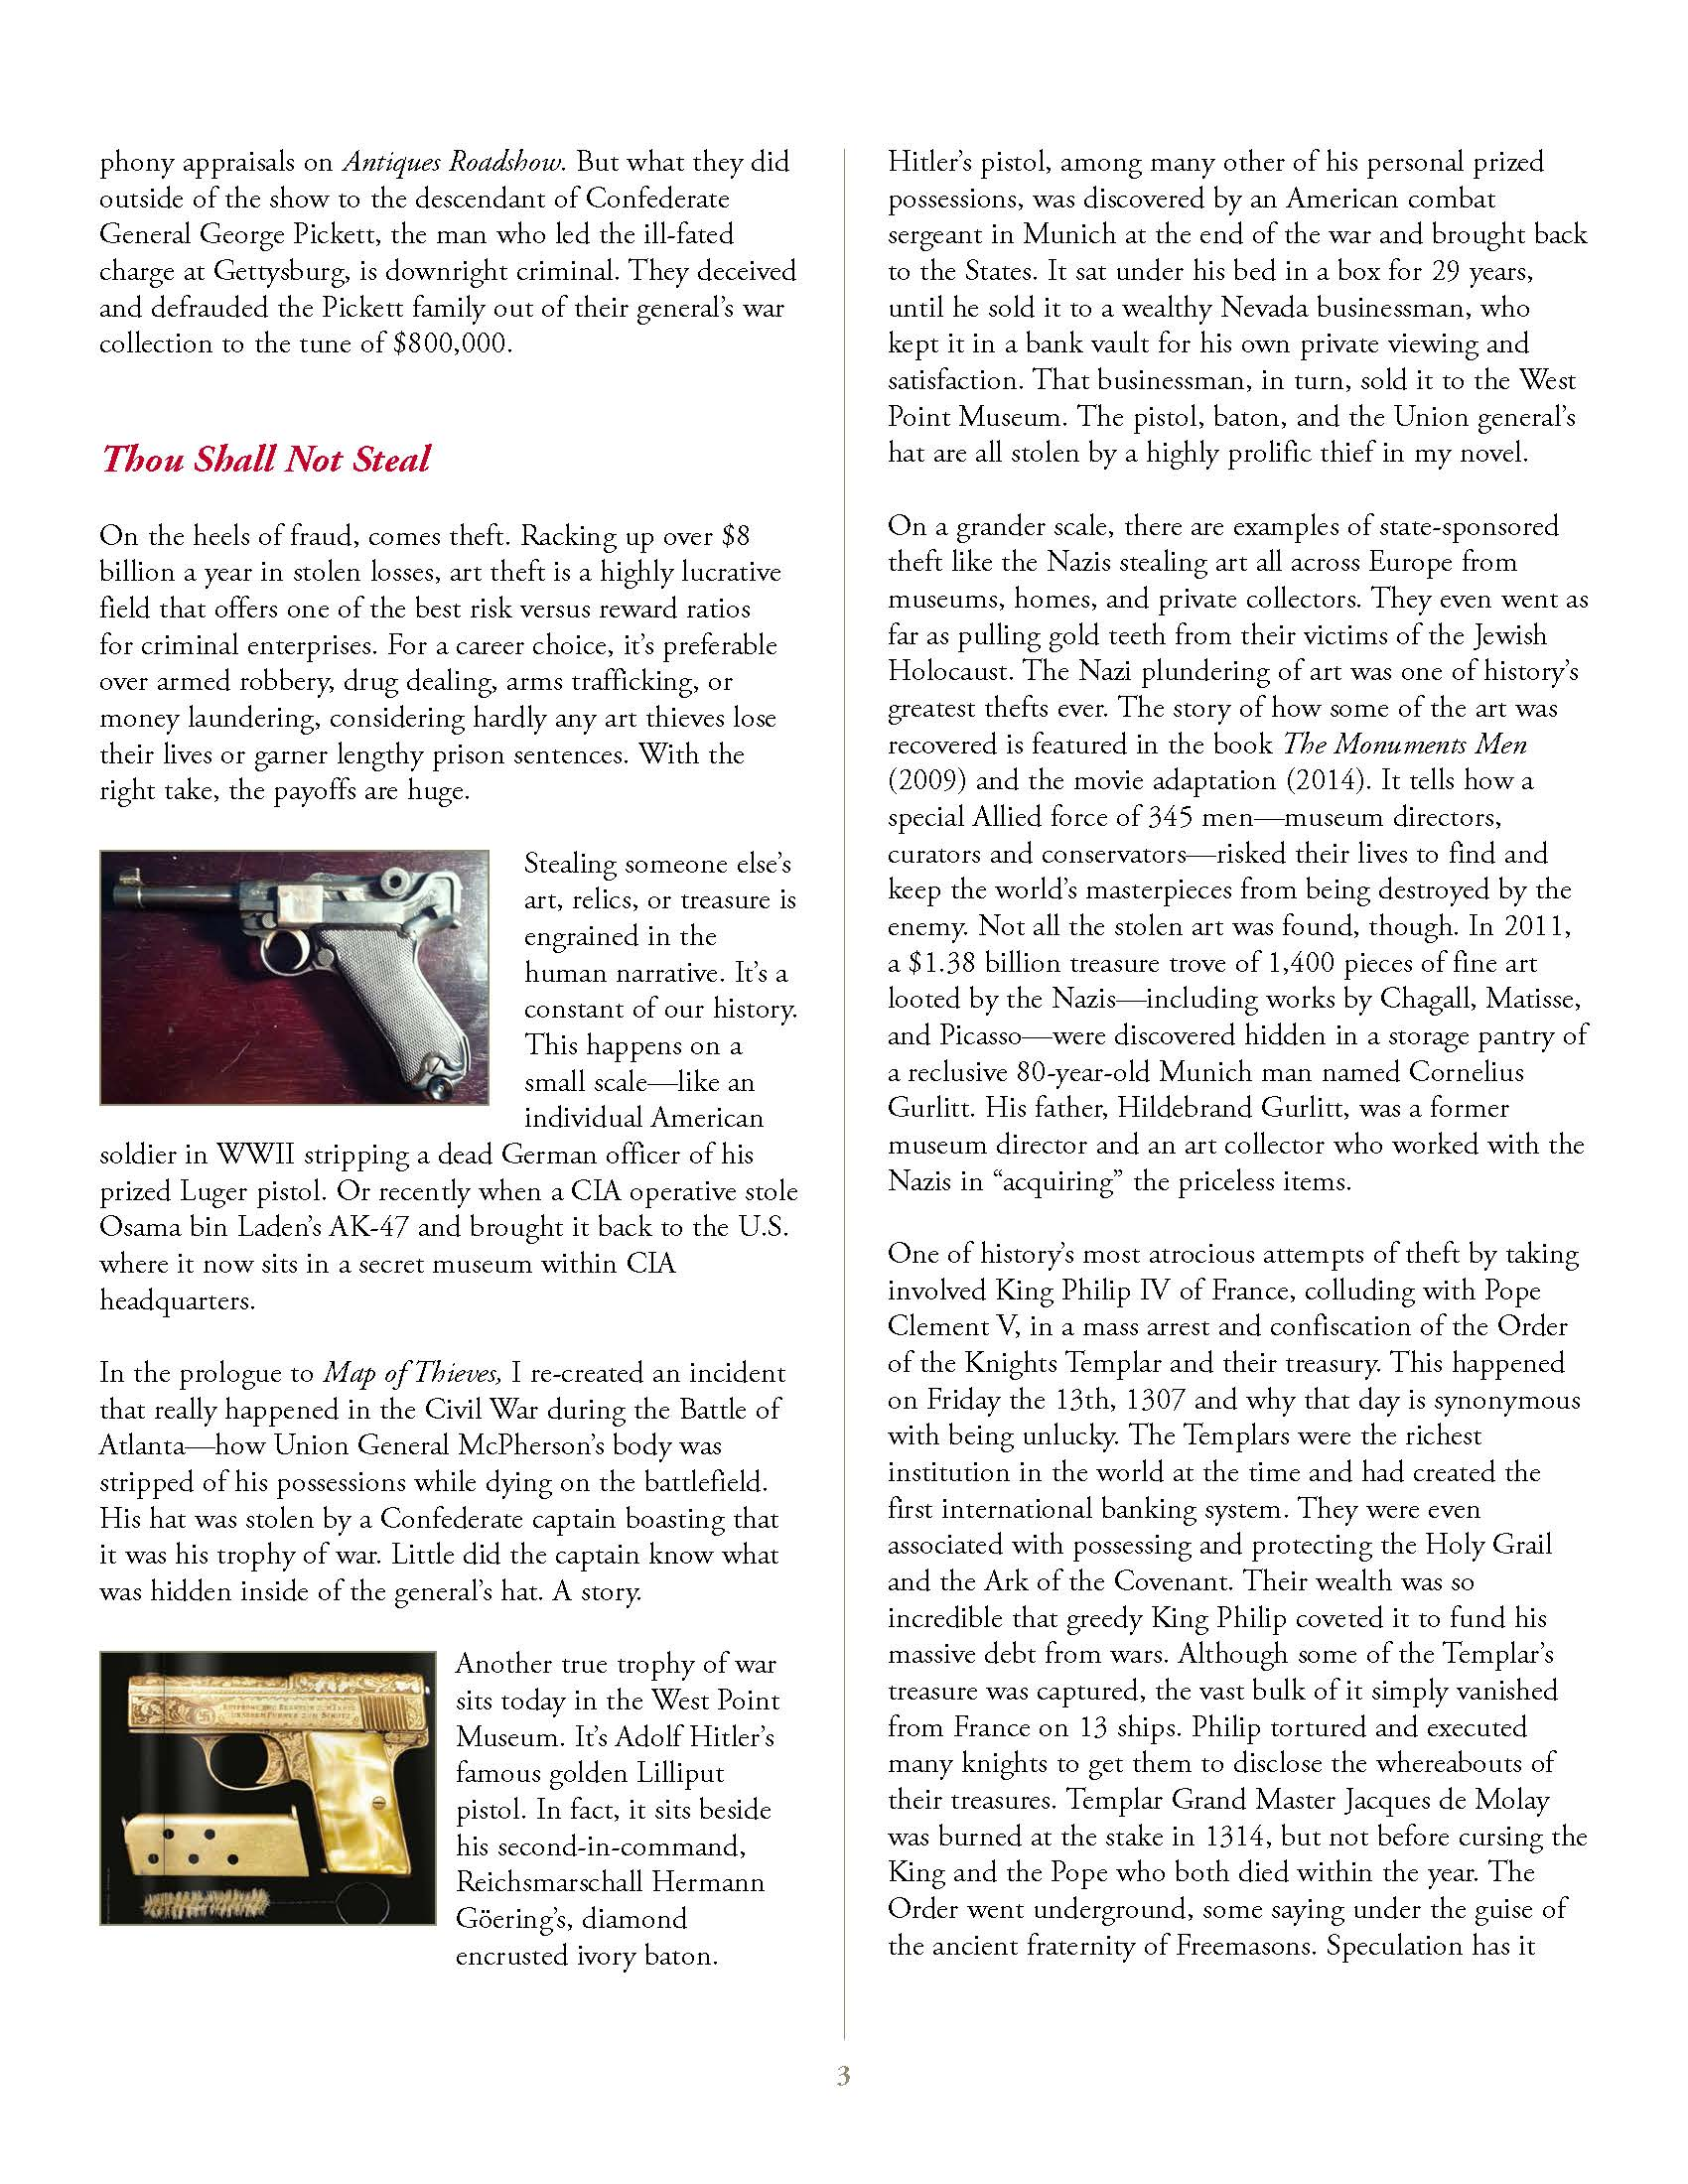 Finding-Treasure-article_Page_3.jpg